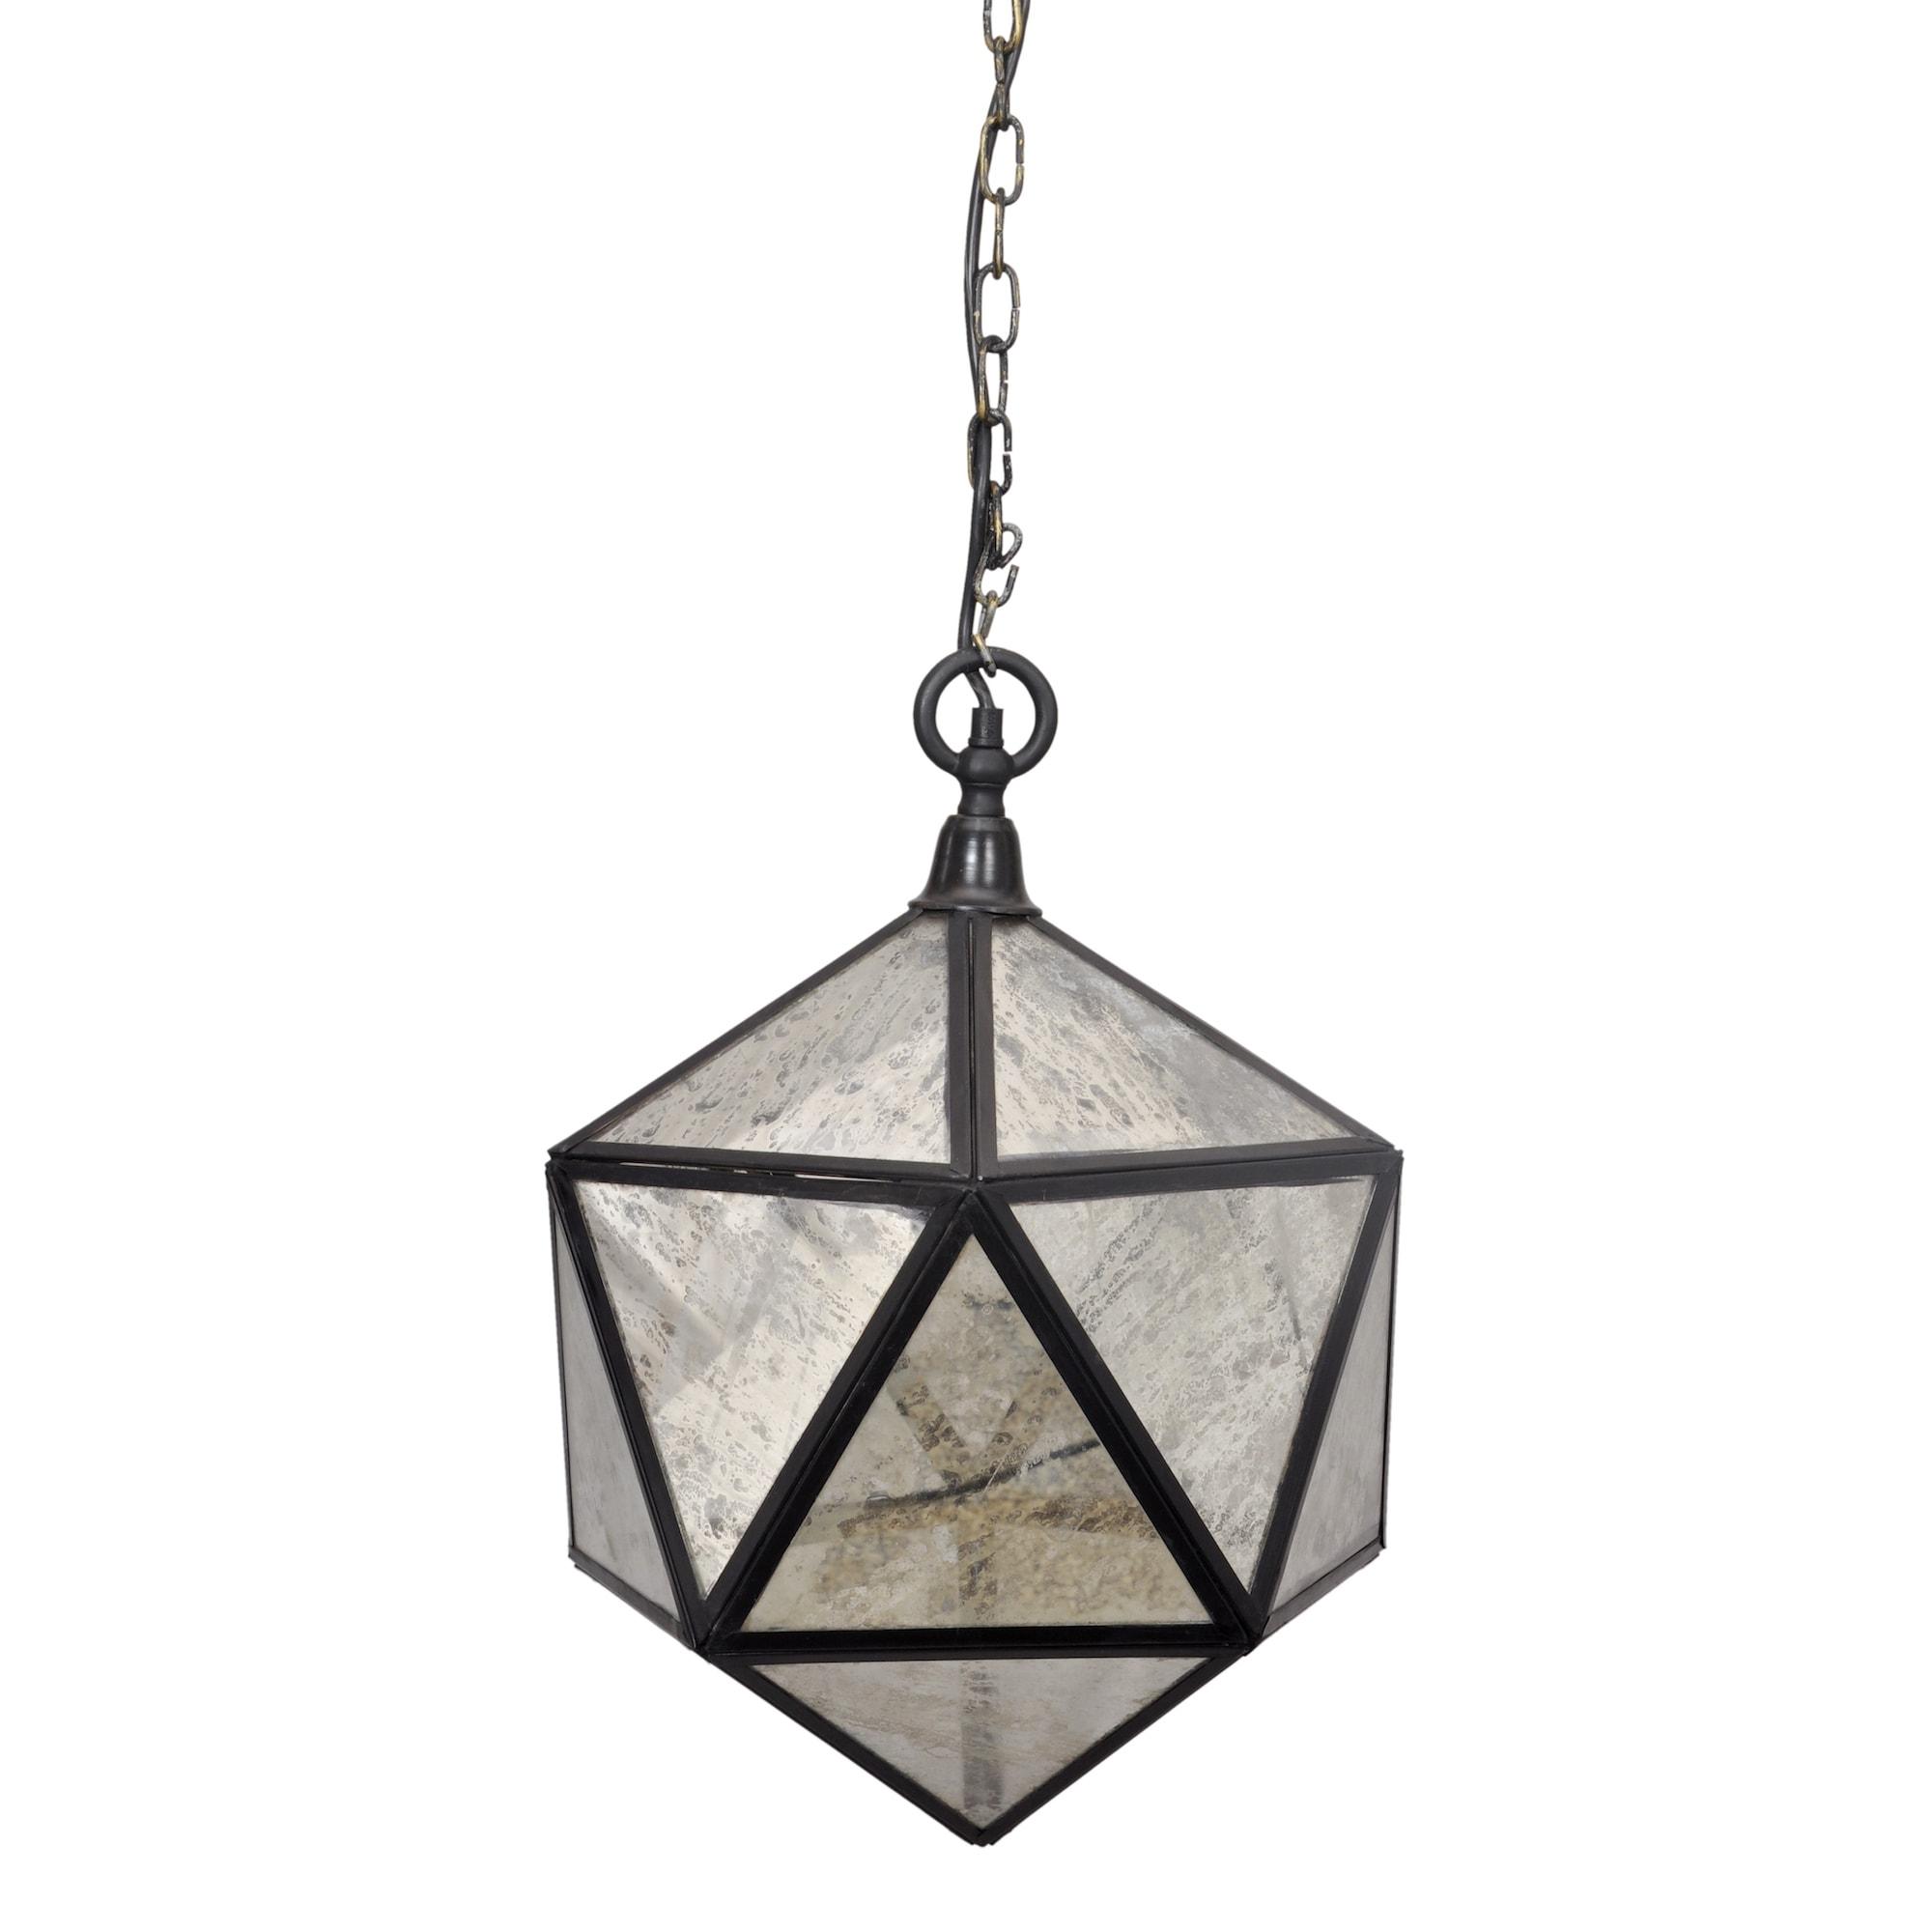 Horizon mercury glass aged bronze prism pendant light ebay horizon mercury glass aged bronze prism pendant light aloadofball Images